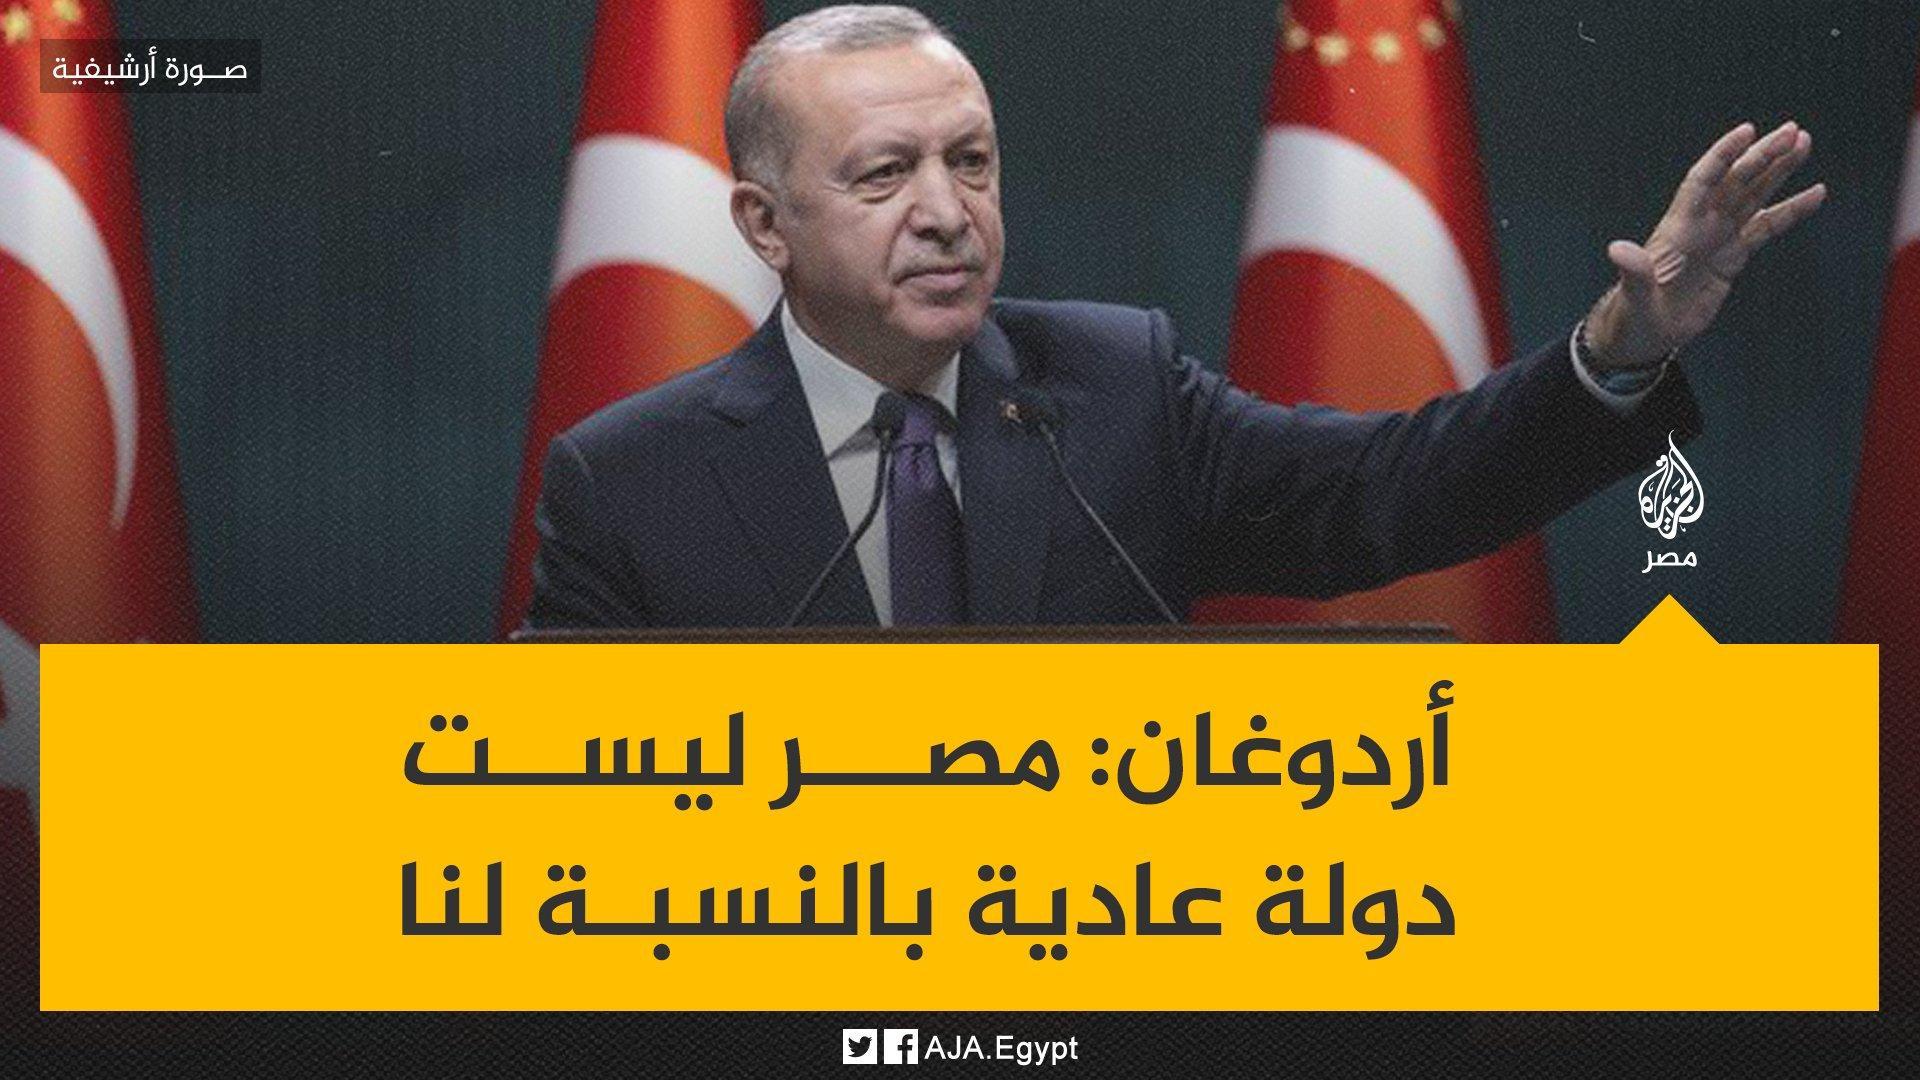 رد: أردوغان ينبه واشنطن : أنا صديق قيم لا تفقدوني !